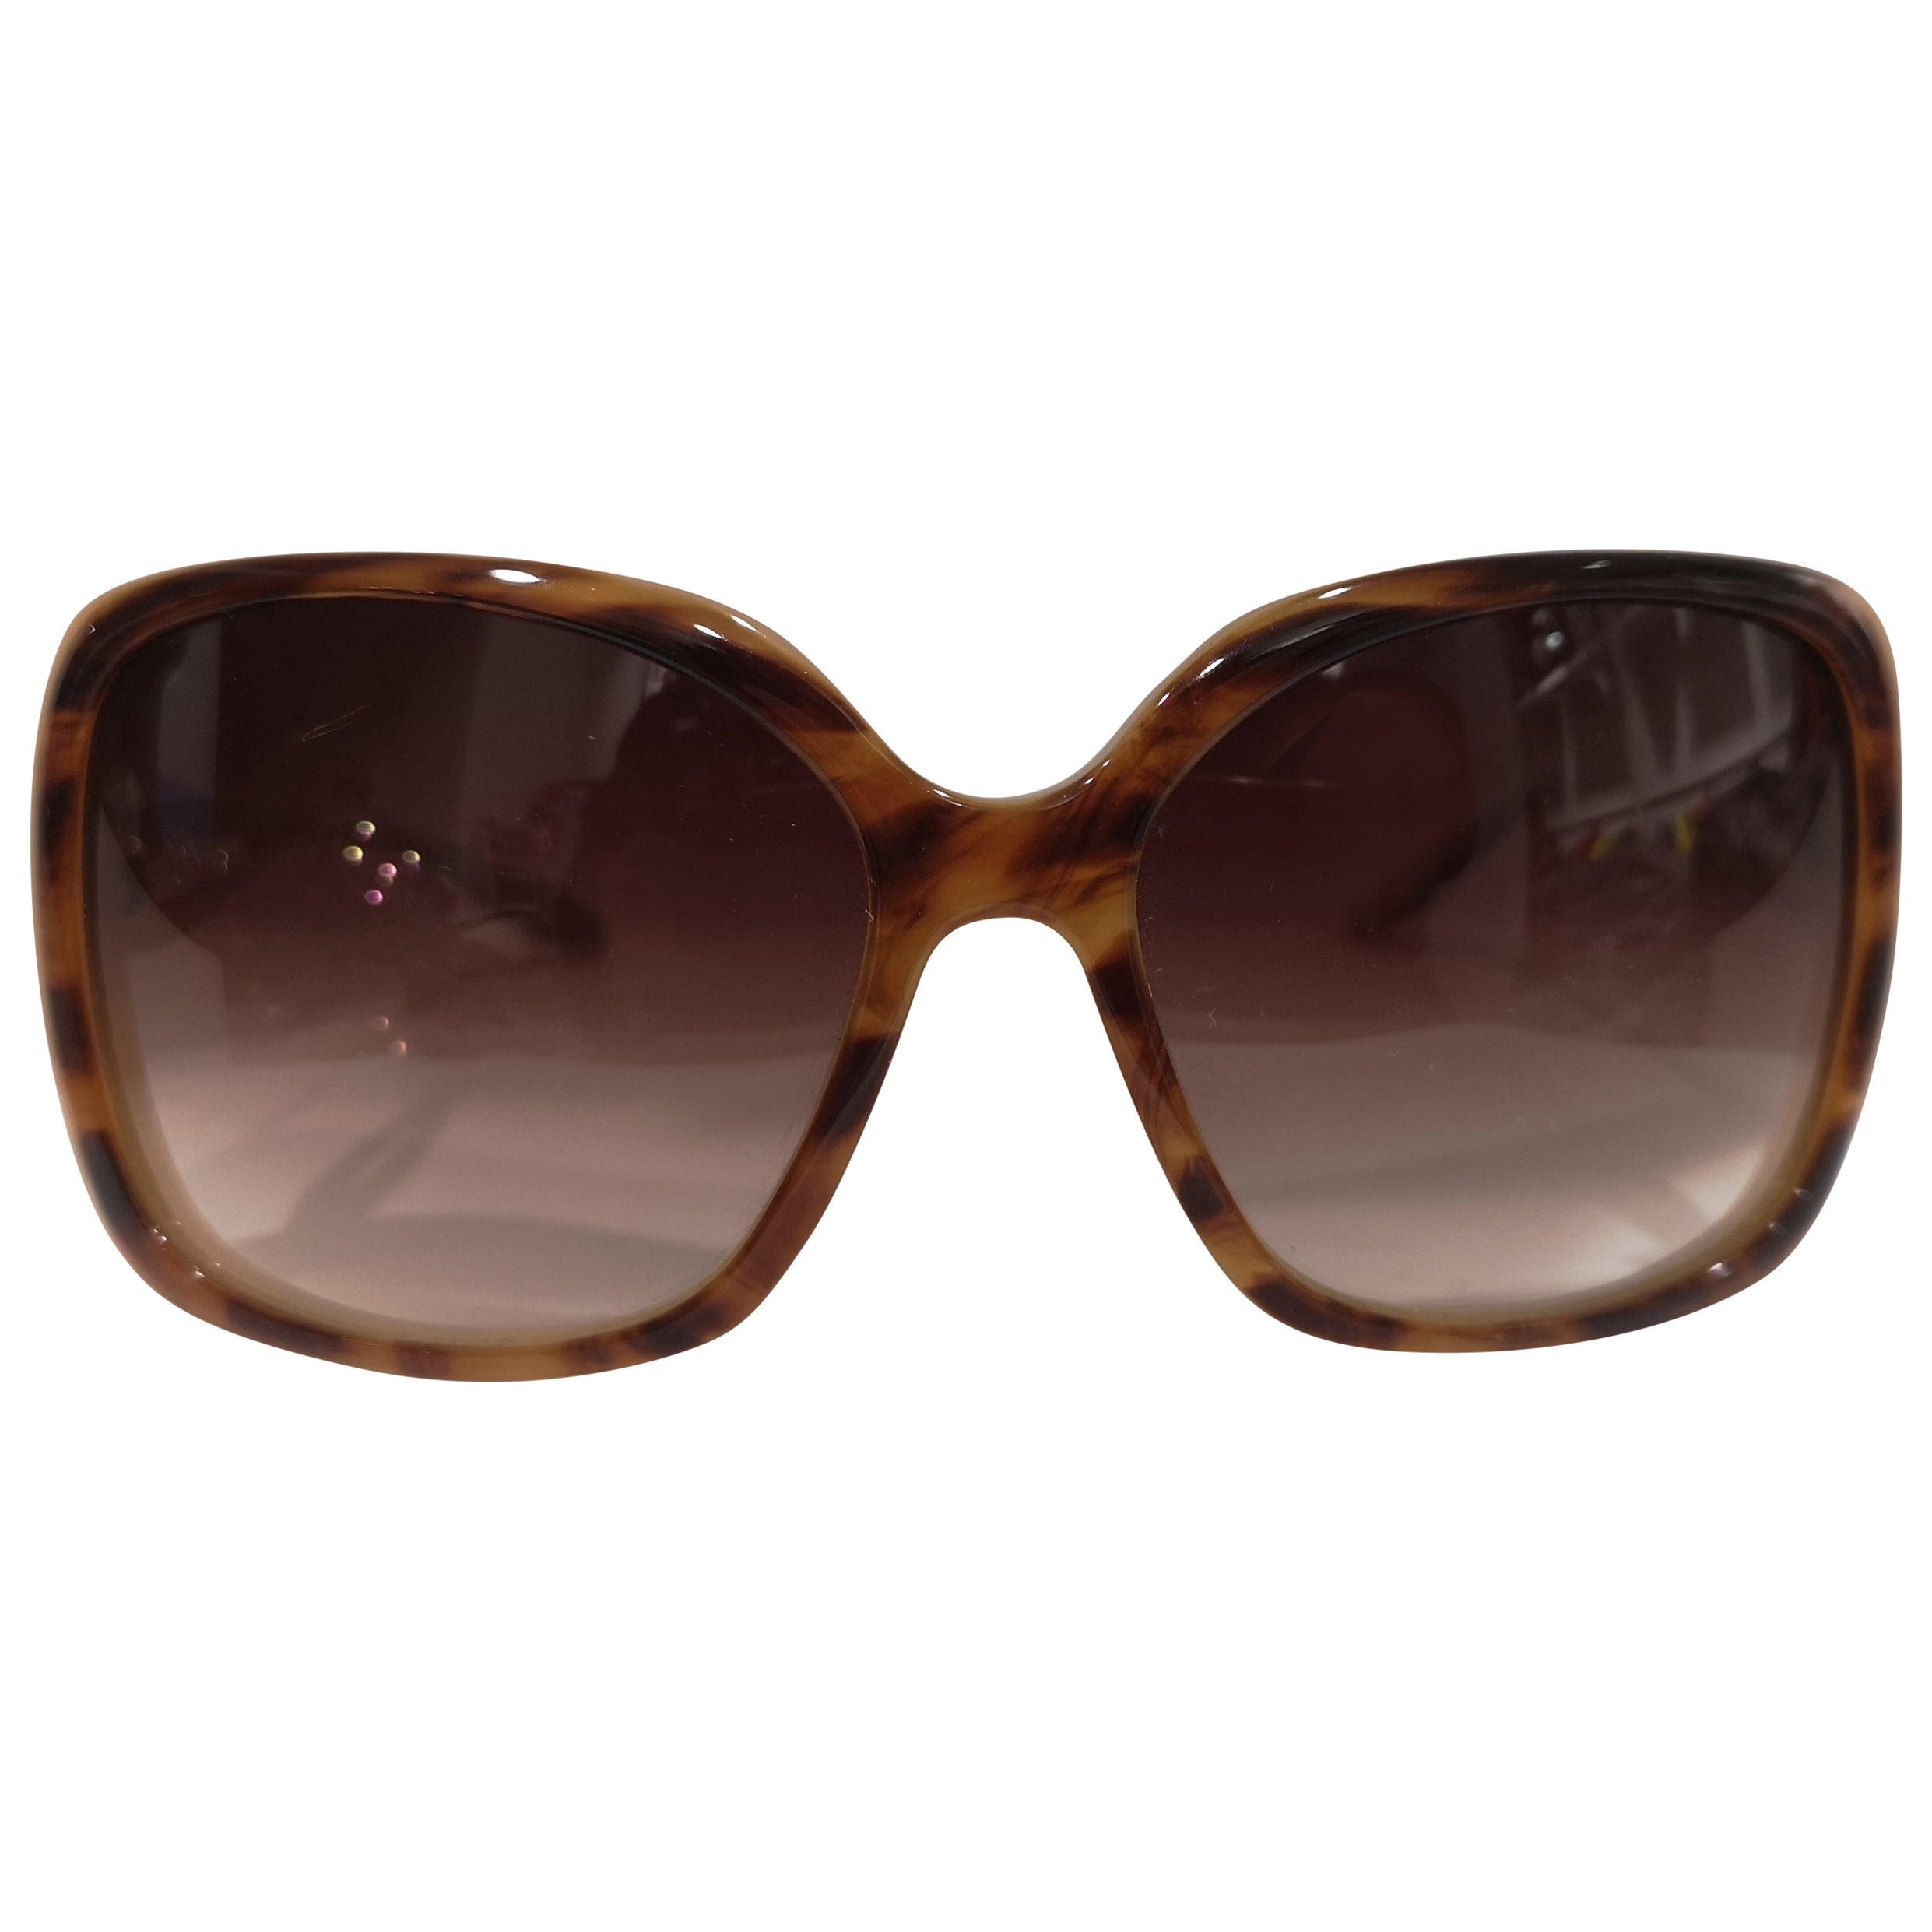 Barton Perreira tortoise light yellow sunglasses still with box